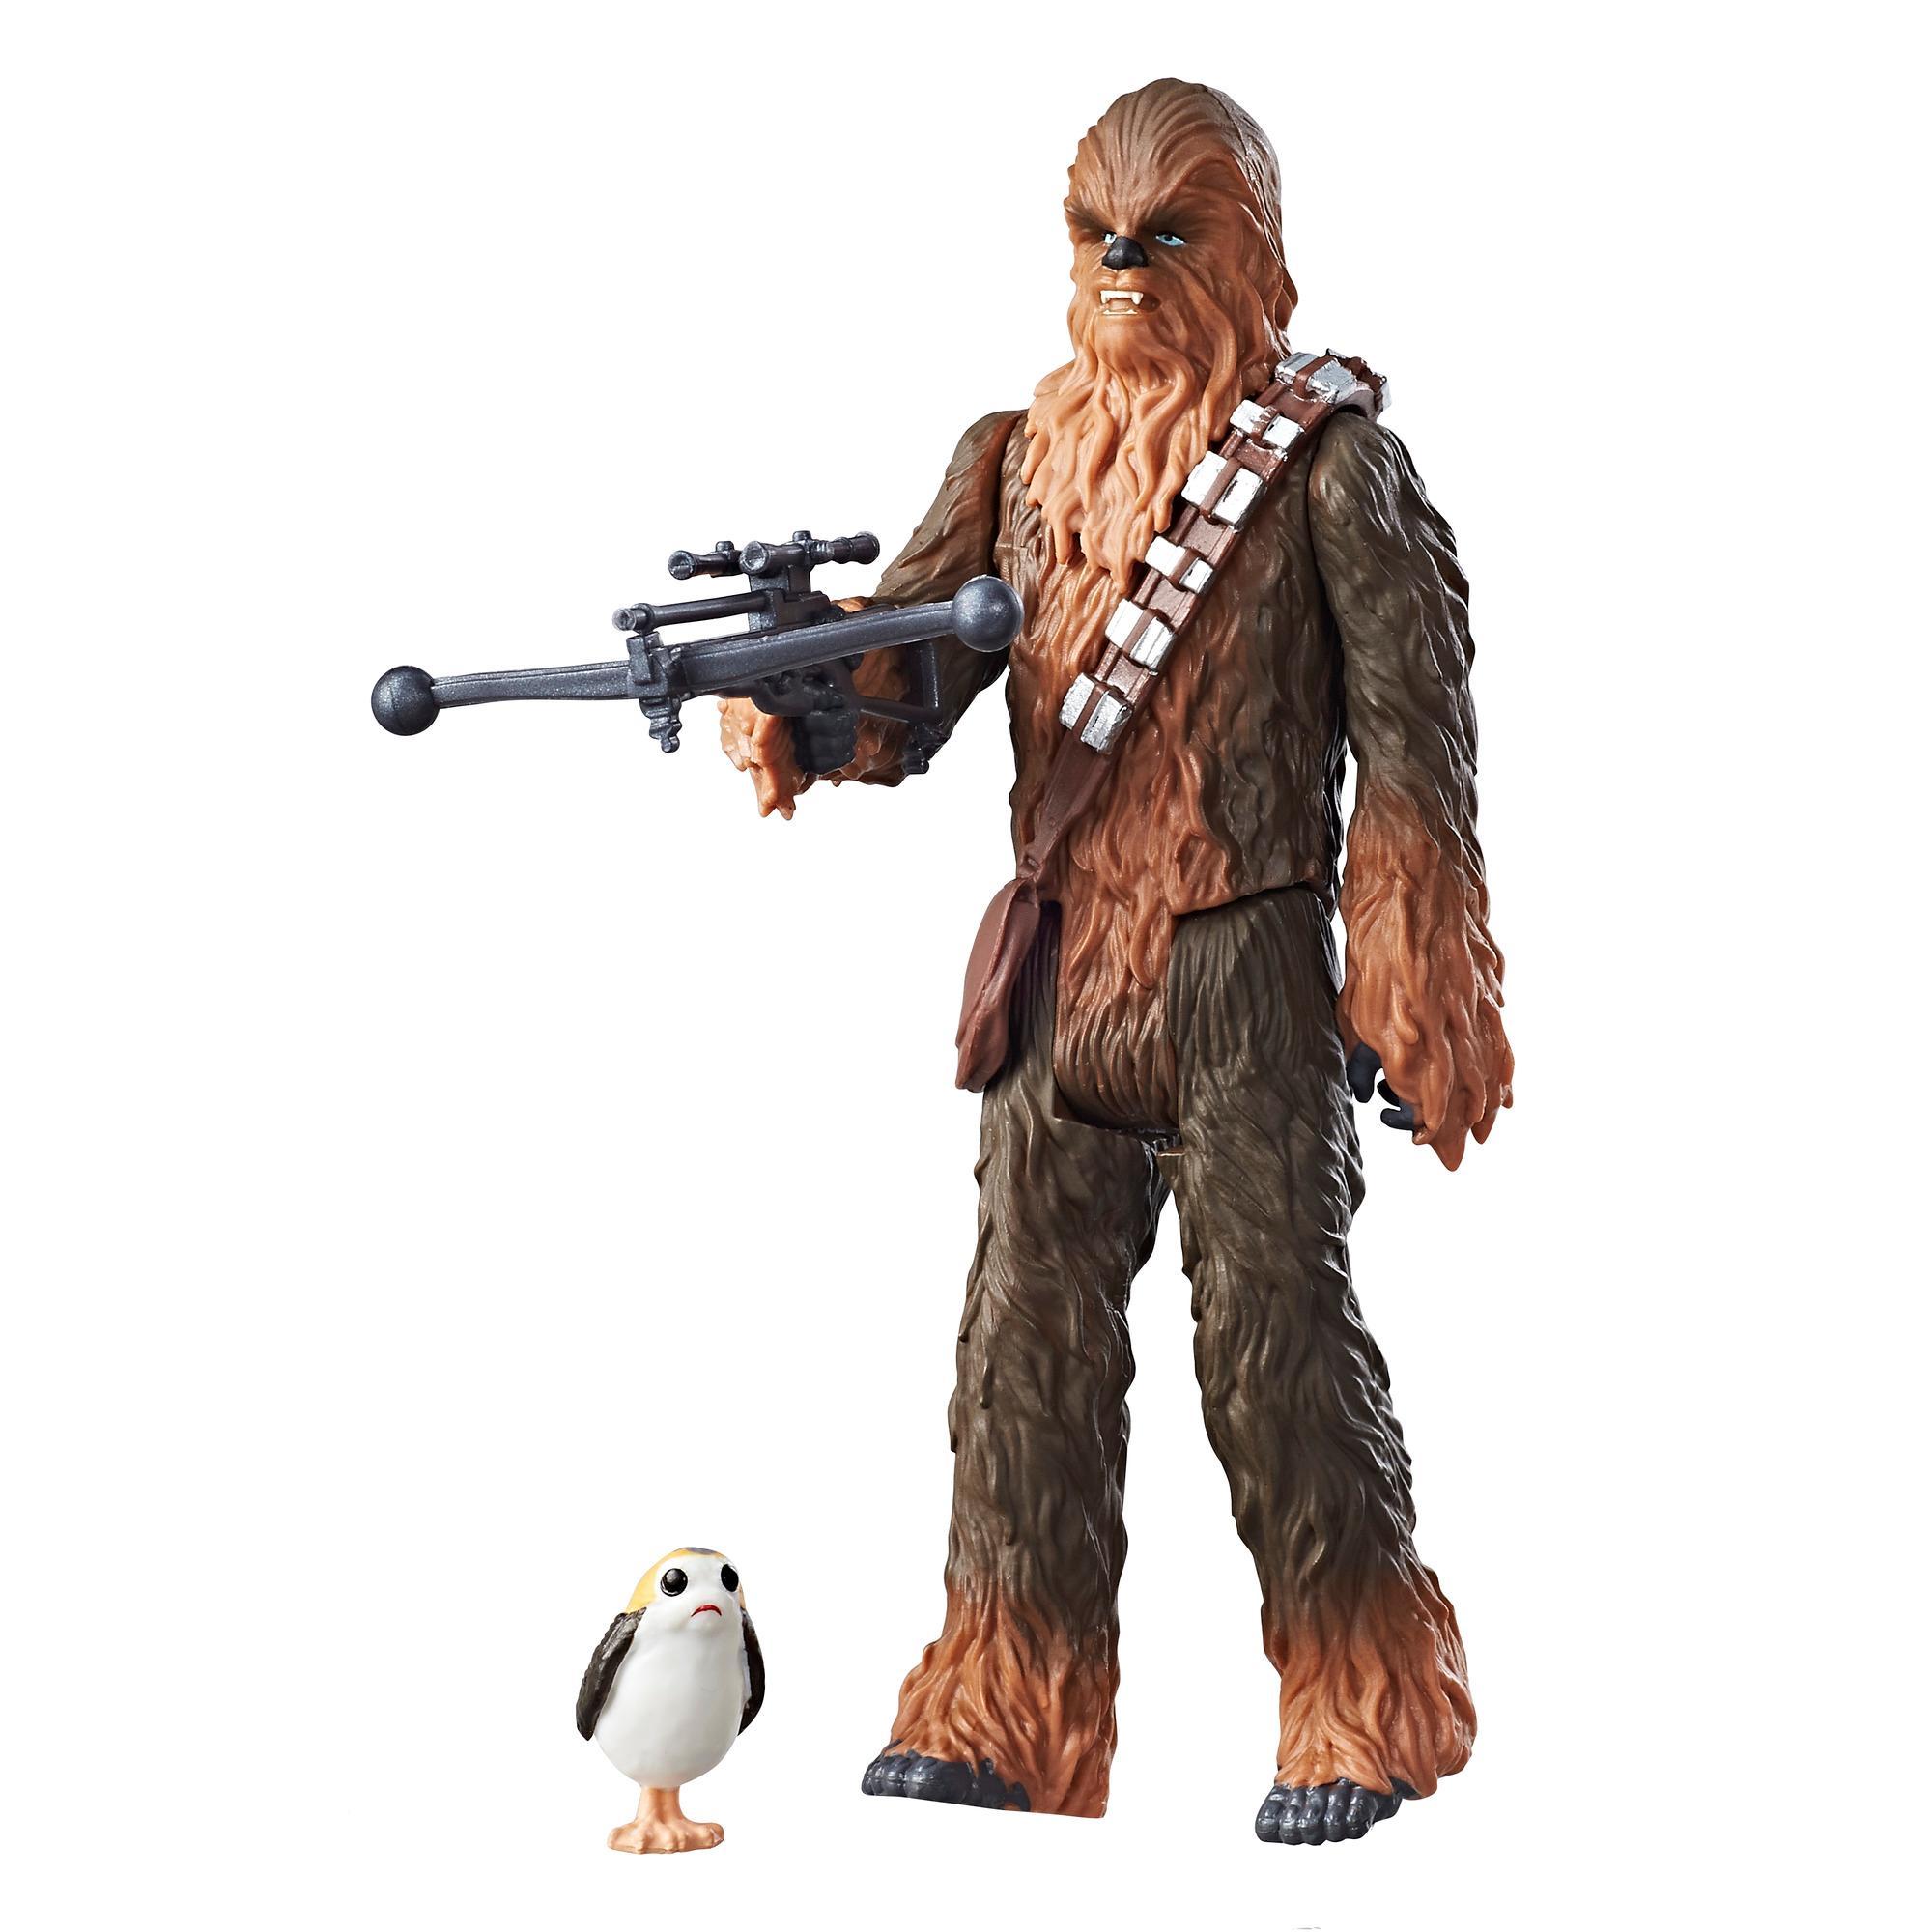 Star Wars Chewbacca Force Link Figure